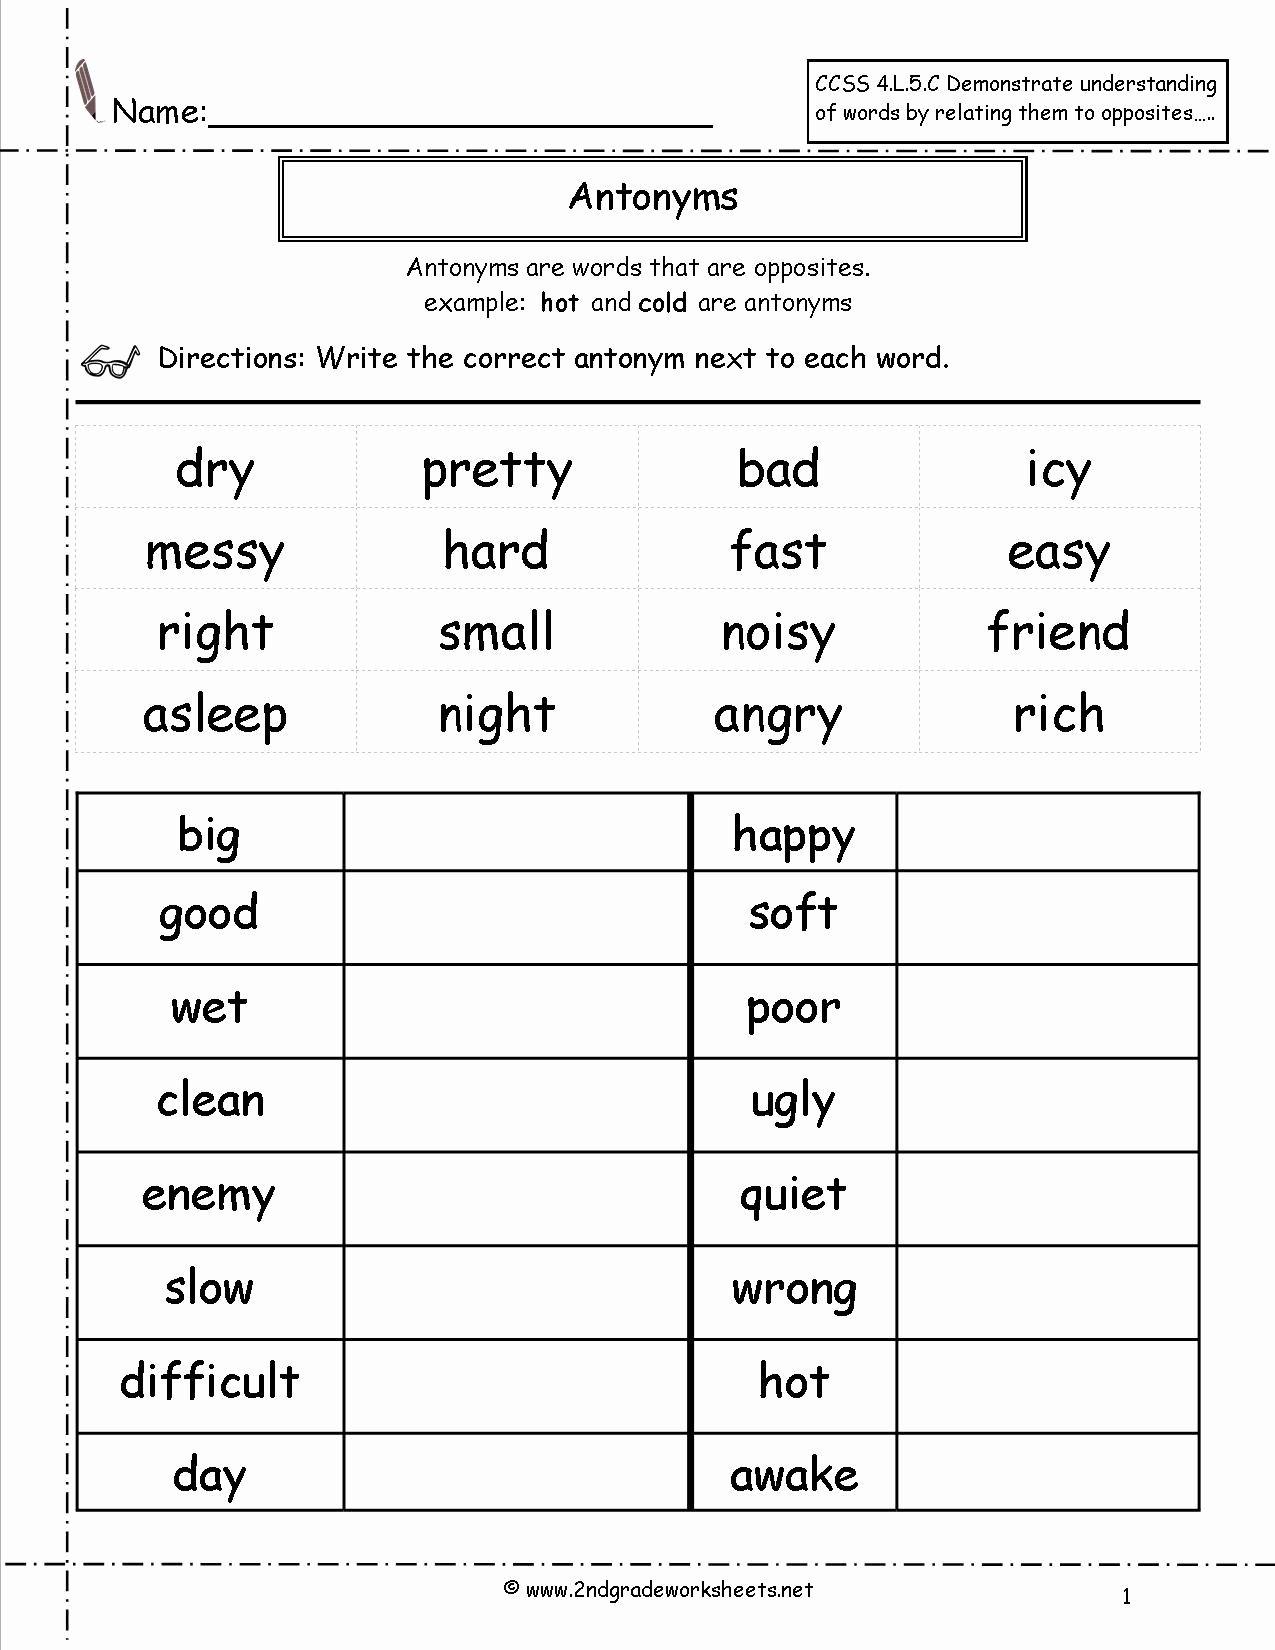 2nd Grade Grammar Worksheets Pdf New Free Language Grammar Worksheets and  Printouts   2nd grade math worksheets [ 1650 x 1275 Pixel ]